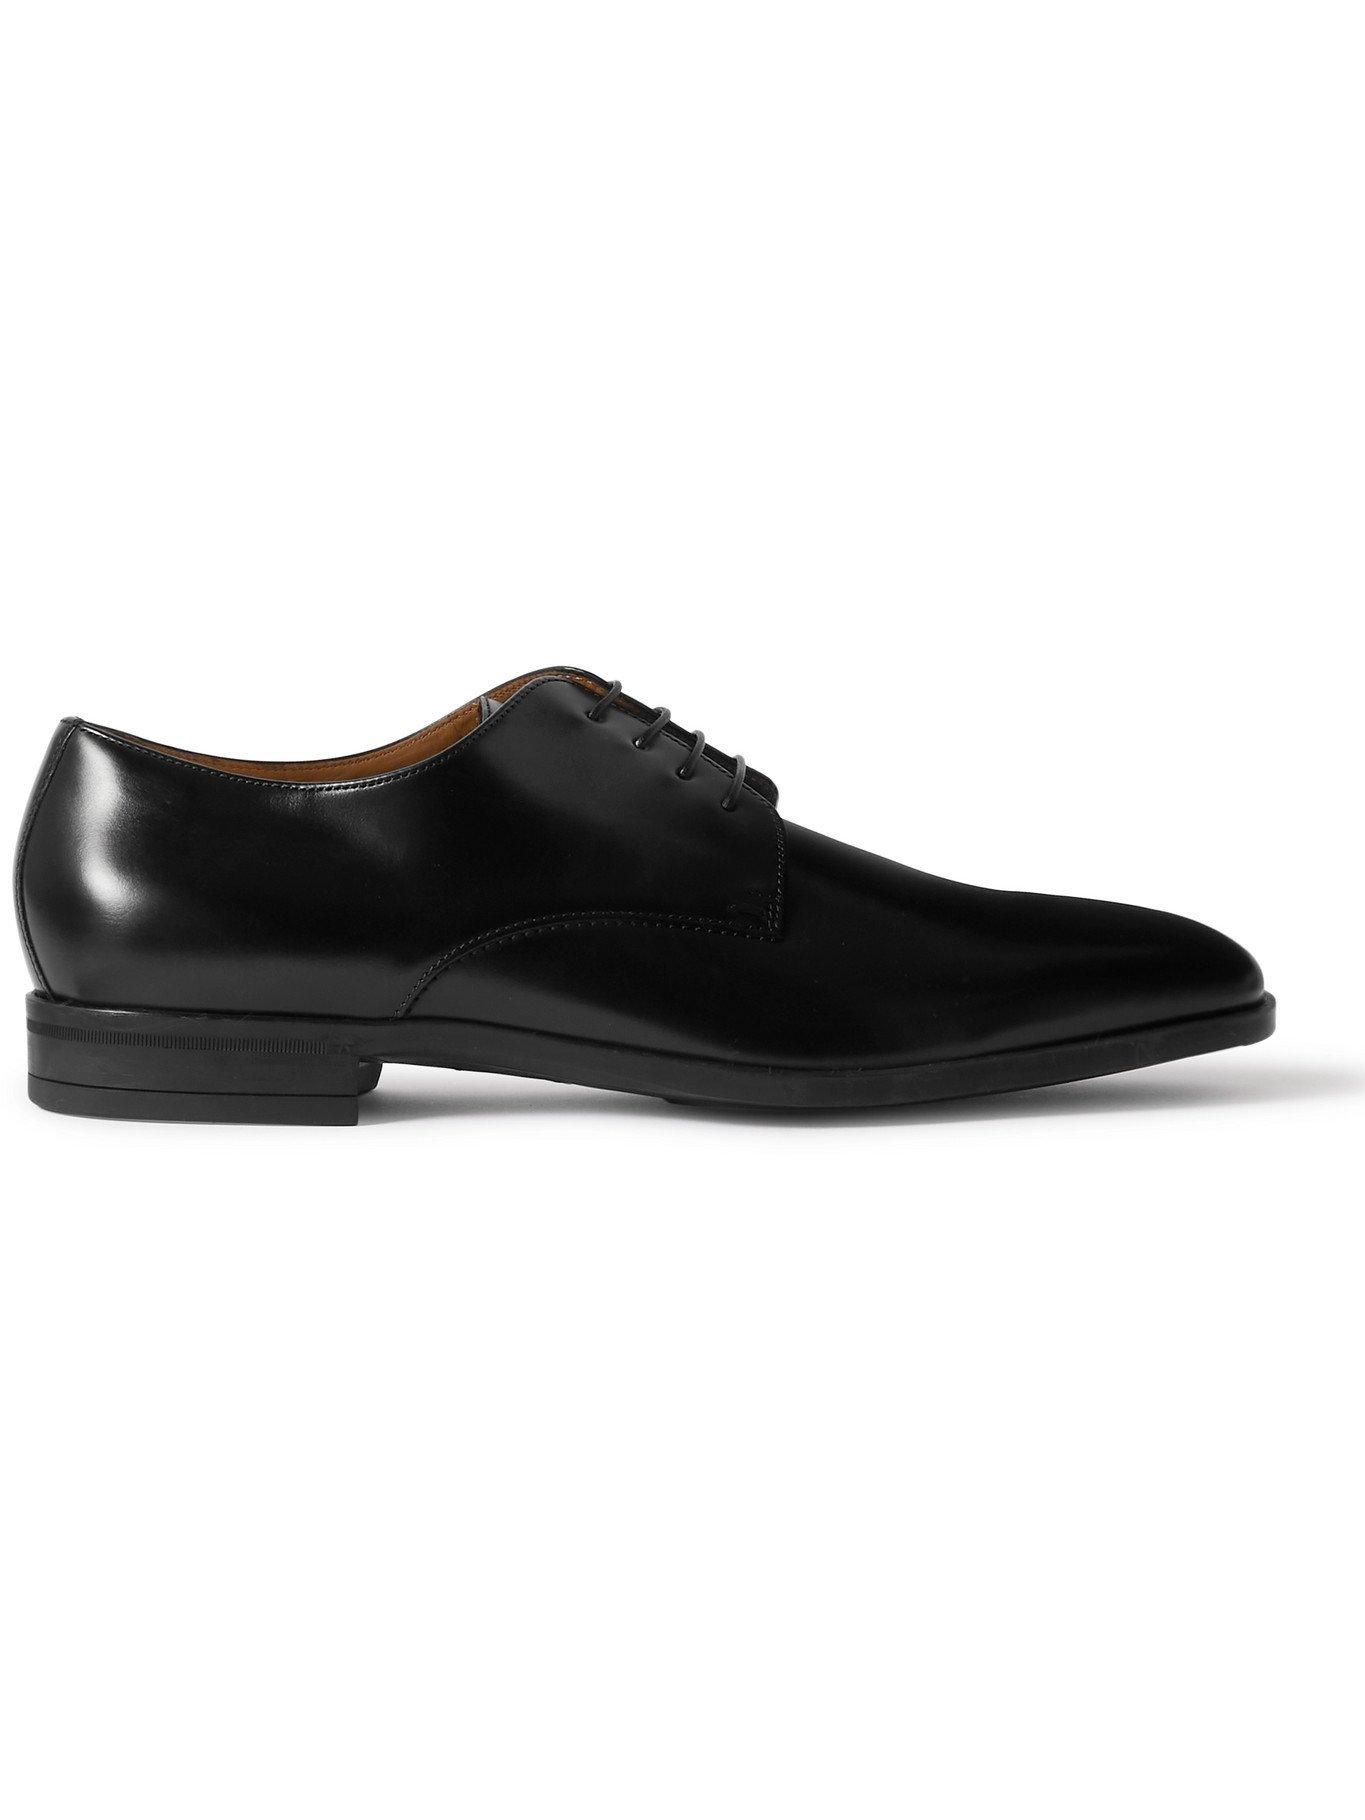 HUGO BOSS - Kensington Leather Derby Shoes - Black